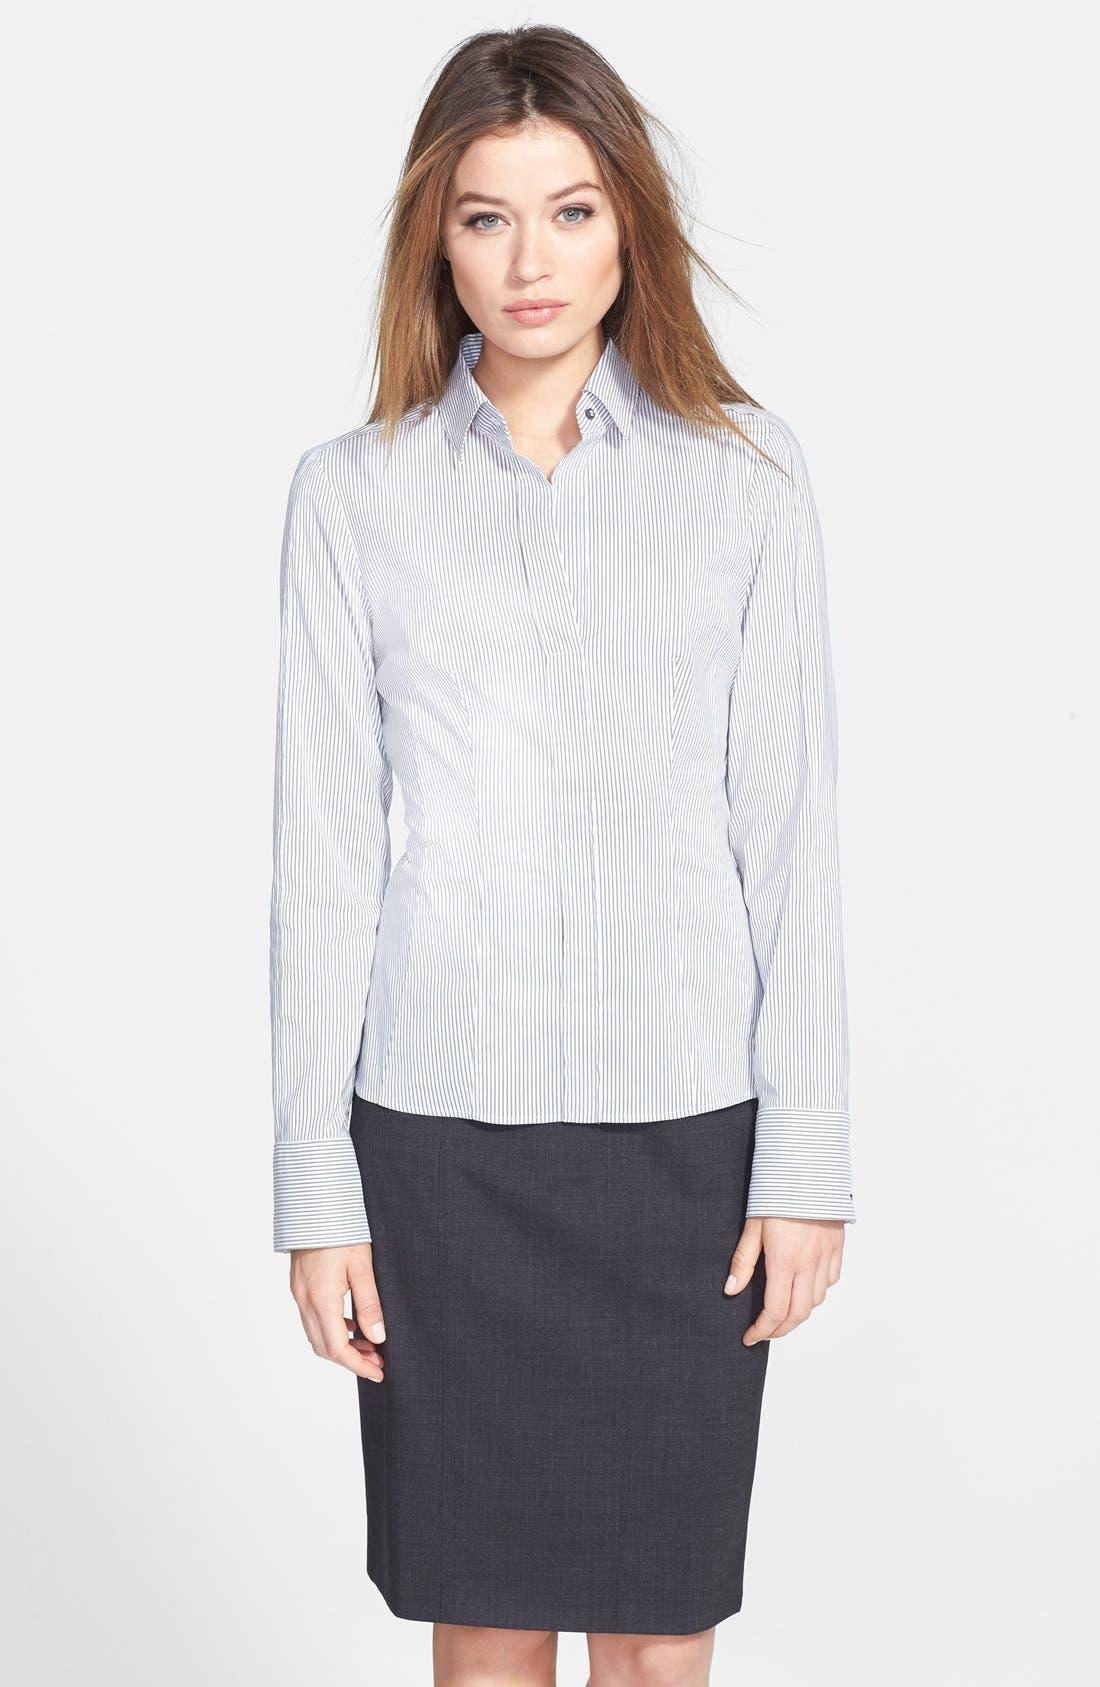 Main Image - BOSS 'Bashina' Fitted Cotton Blend Pinstripe V-Neck Blouse